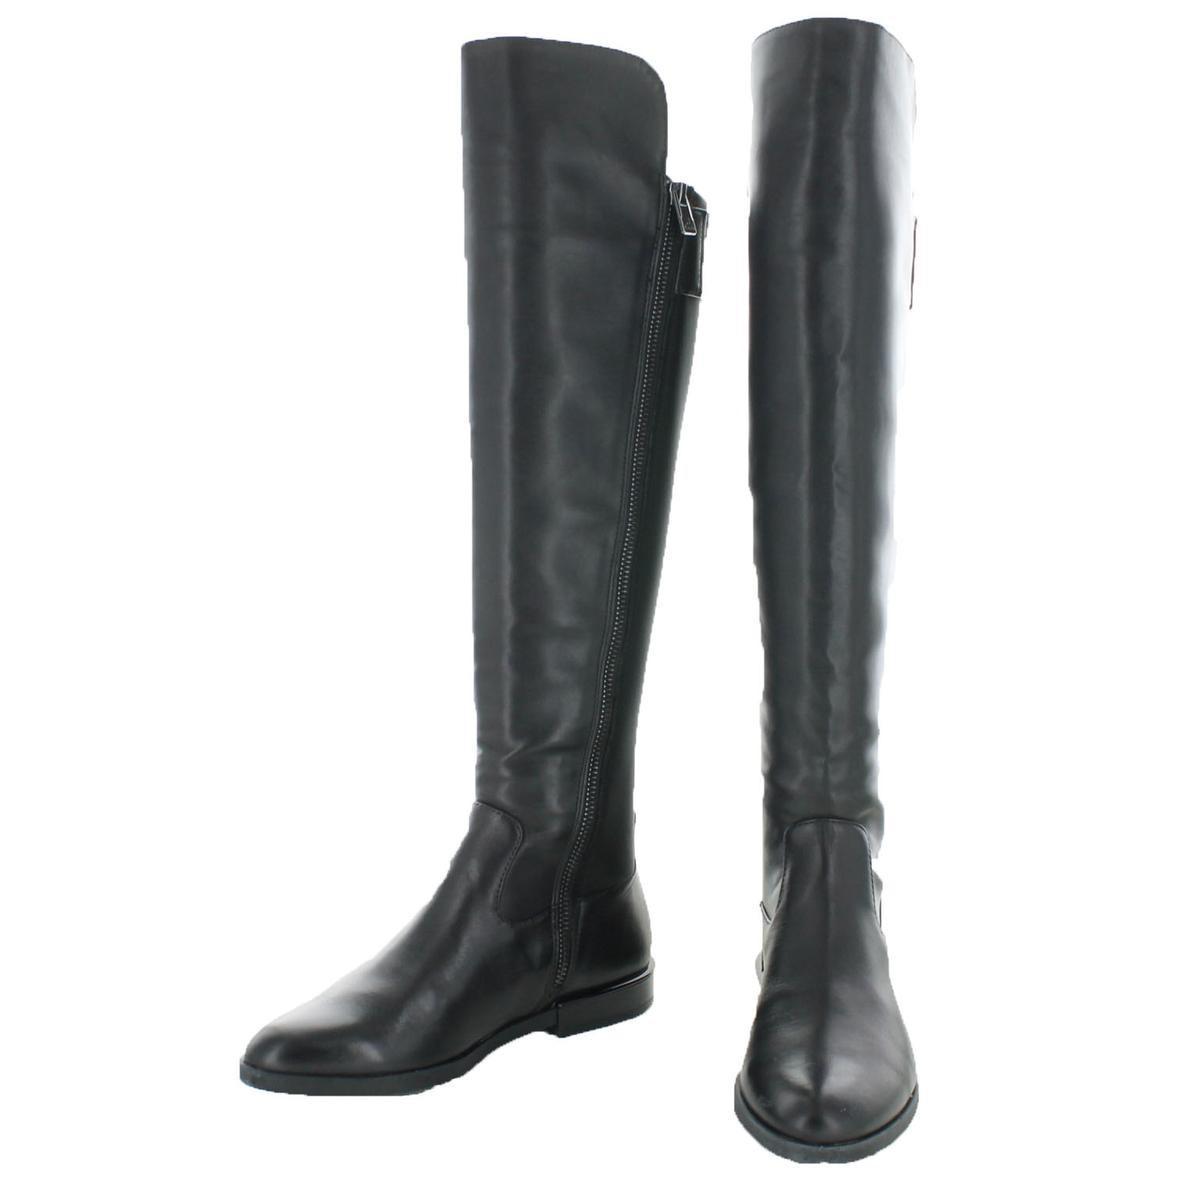 65c75991c87 Lyst - Calvin Klein Priya Cow Silk neoprene Over-the-knee Tall ...